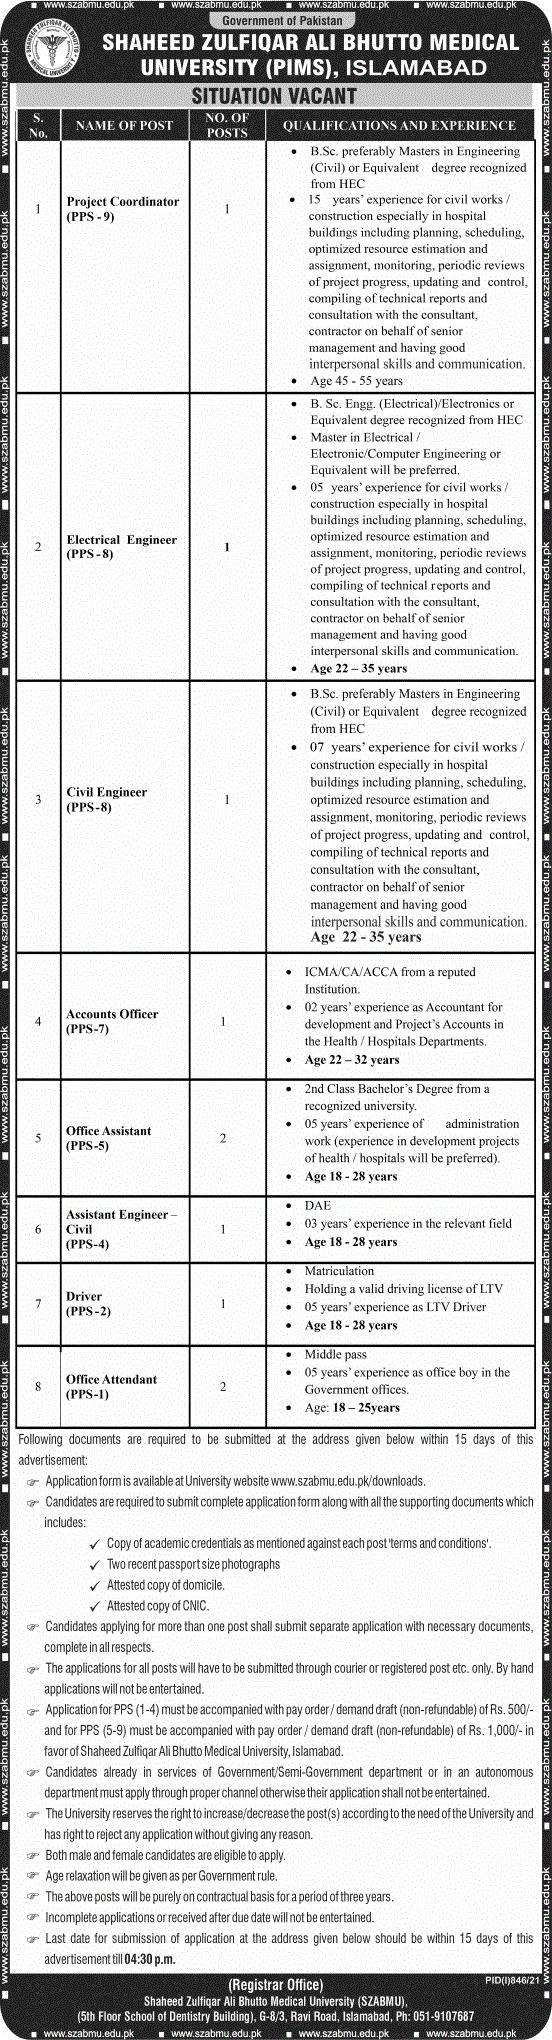 www.szabmu.edu.pk Jobs 2021 - SZABMU Shaheed Zulfiqar Ali Bhutto Medical University Jobs 2021 in Pakistan